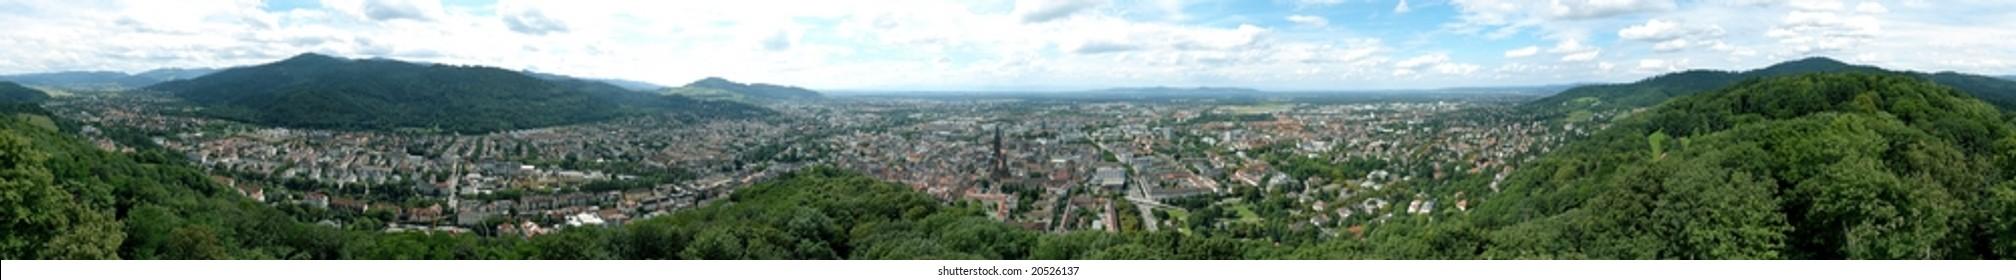 360 deg. panorama view of Freiburg im Breisgau, Germany